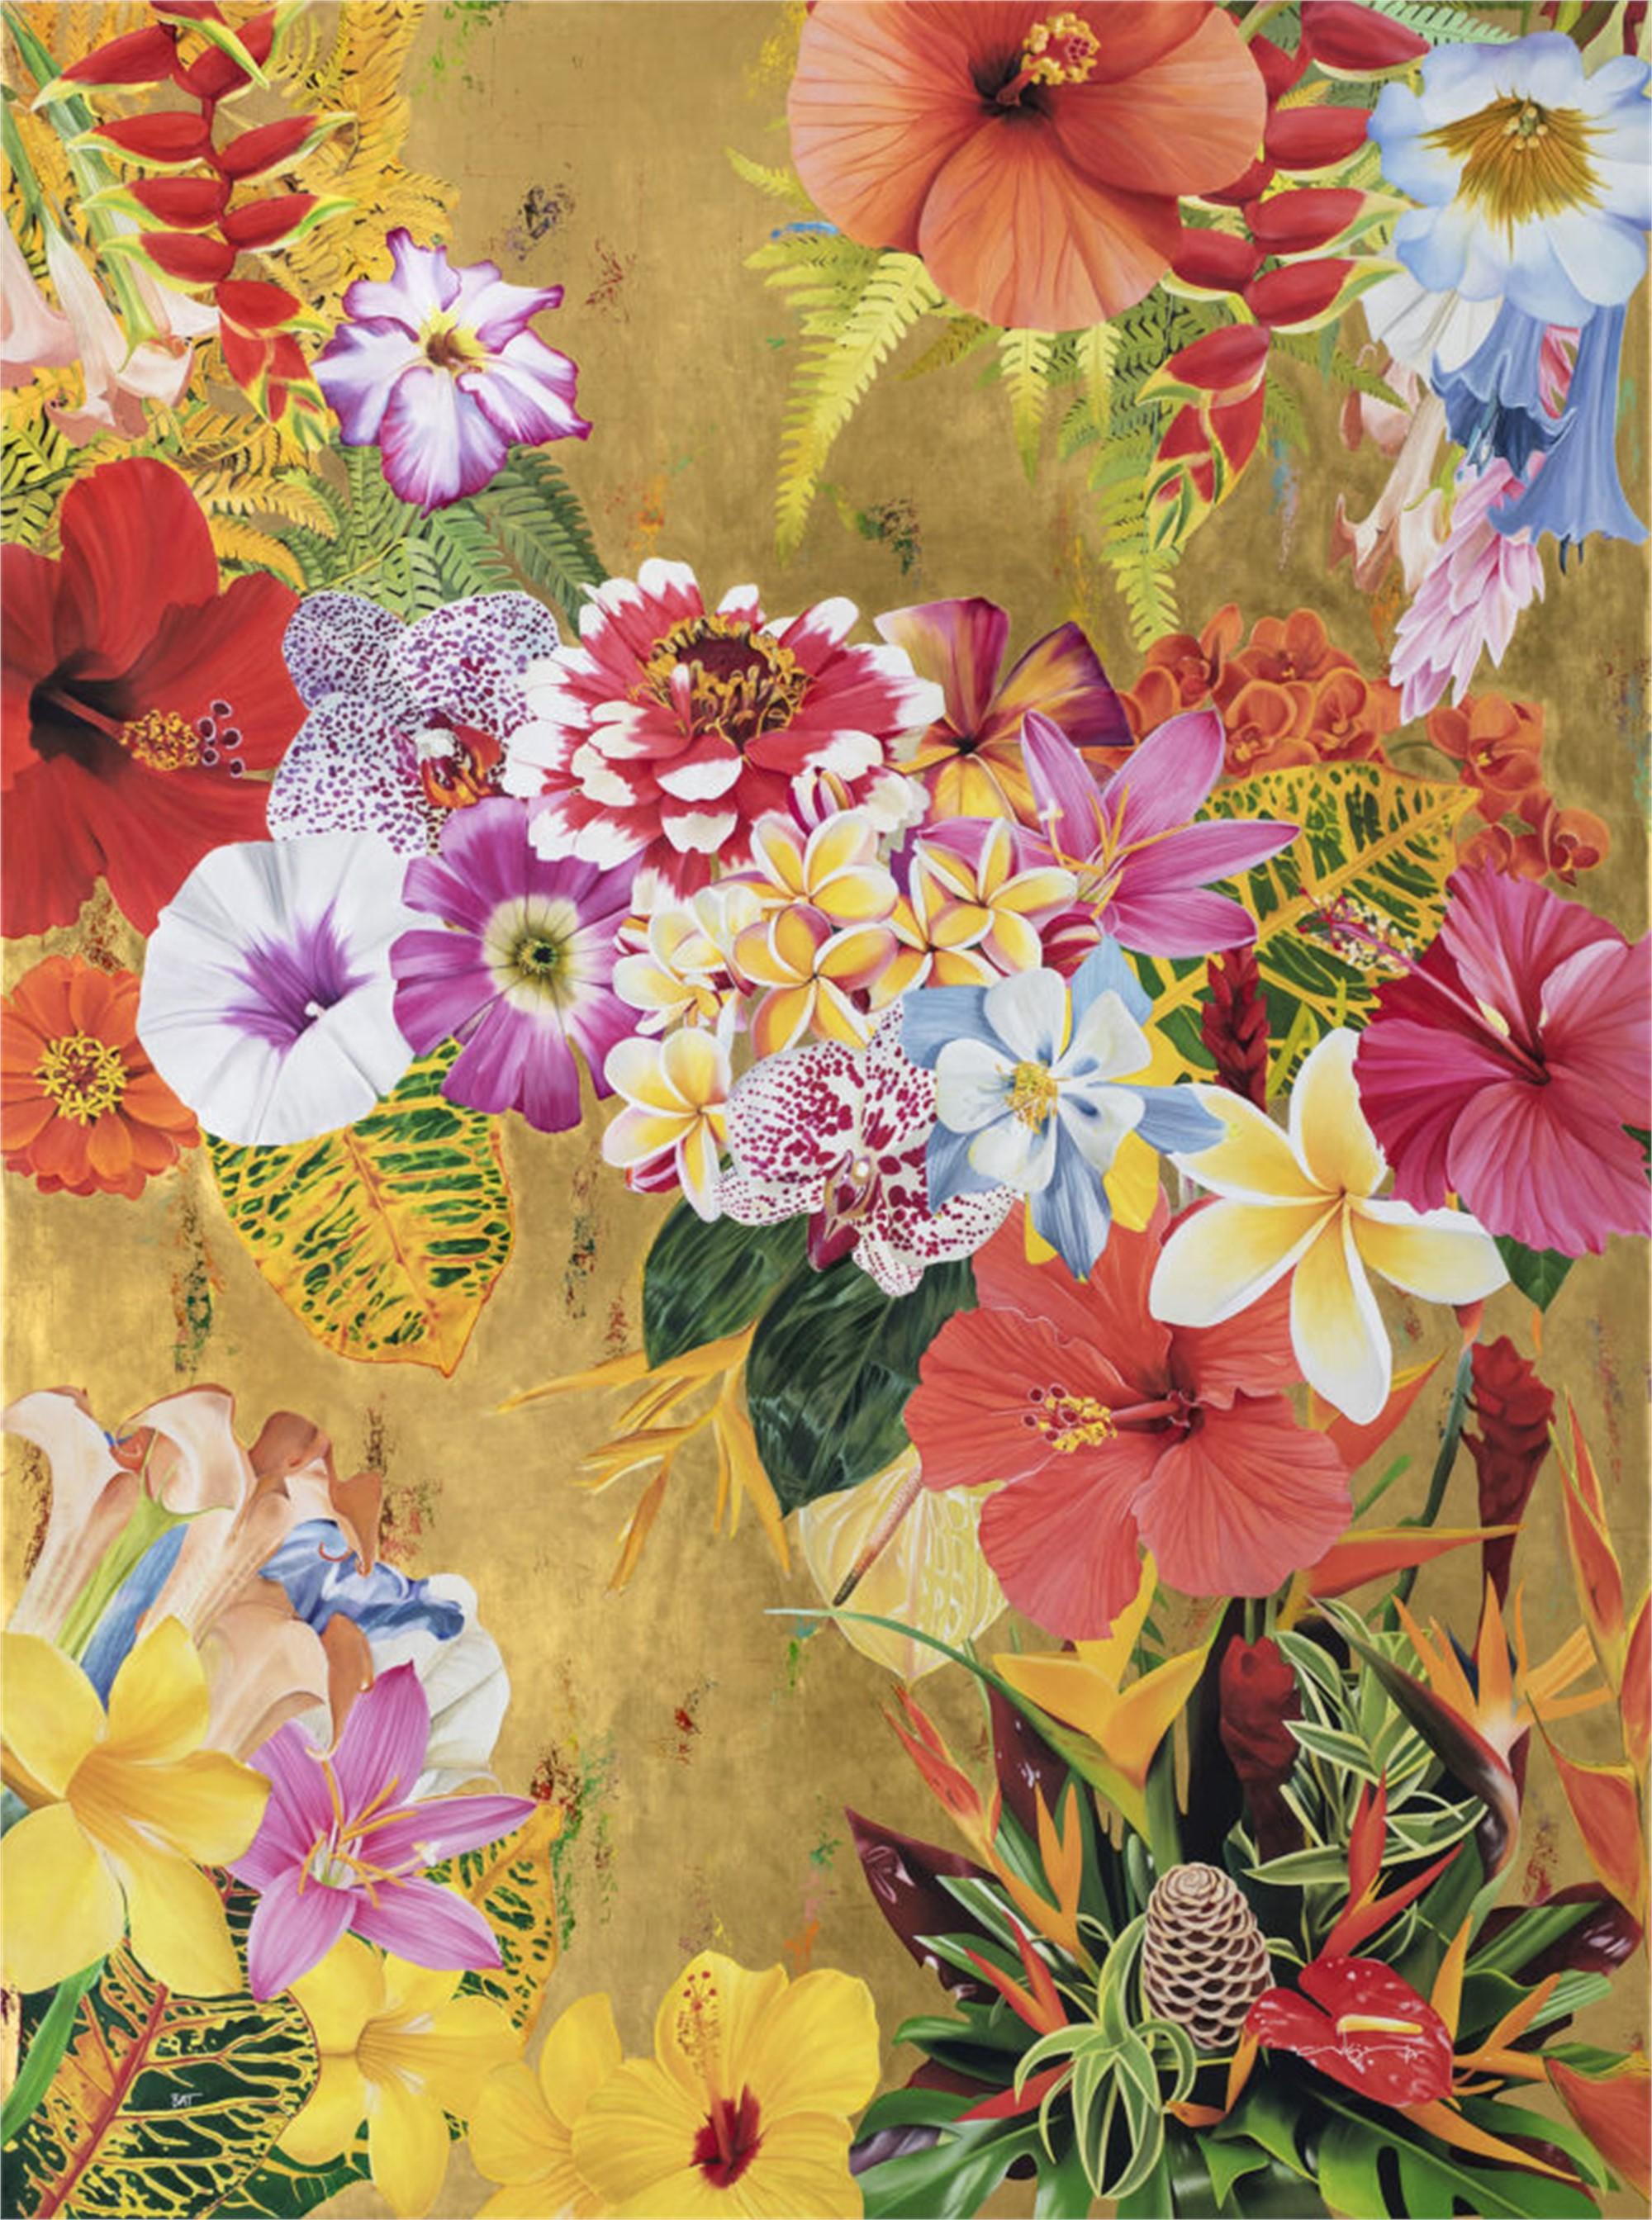 Gild the Lily I by Carlos Rolón